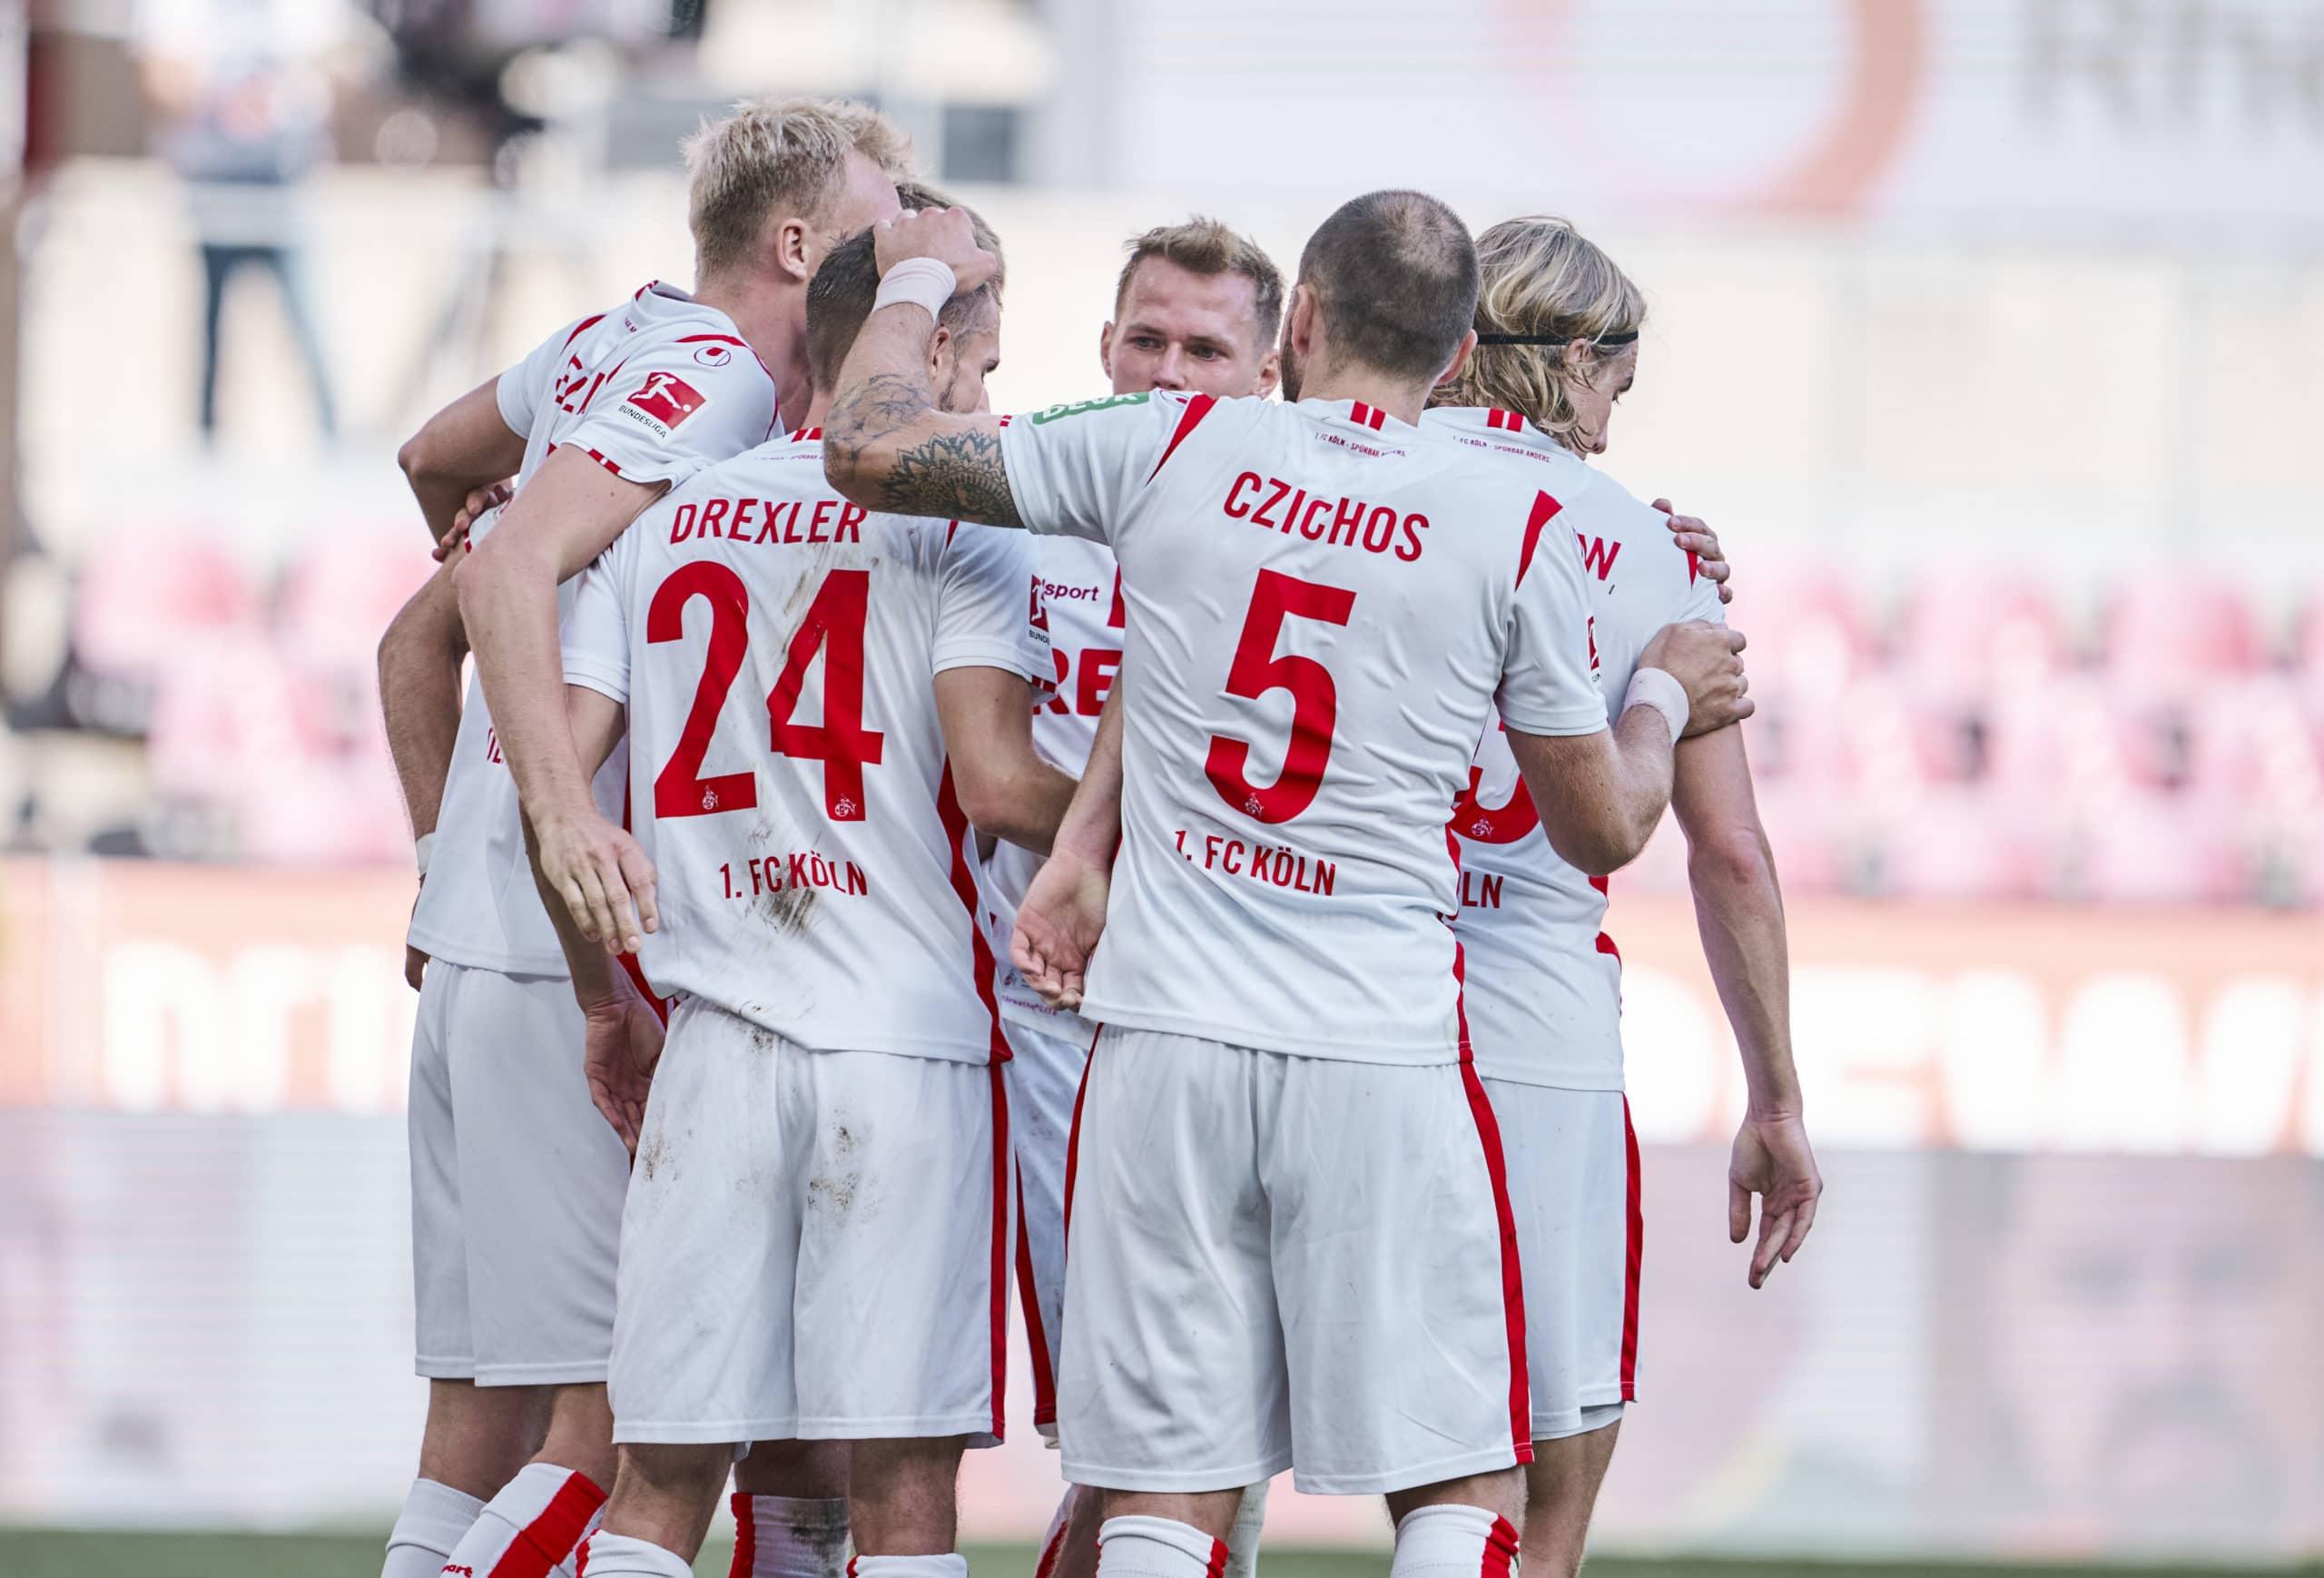 1. FC Köln – Gaffel Bundesliga Tippspiel